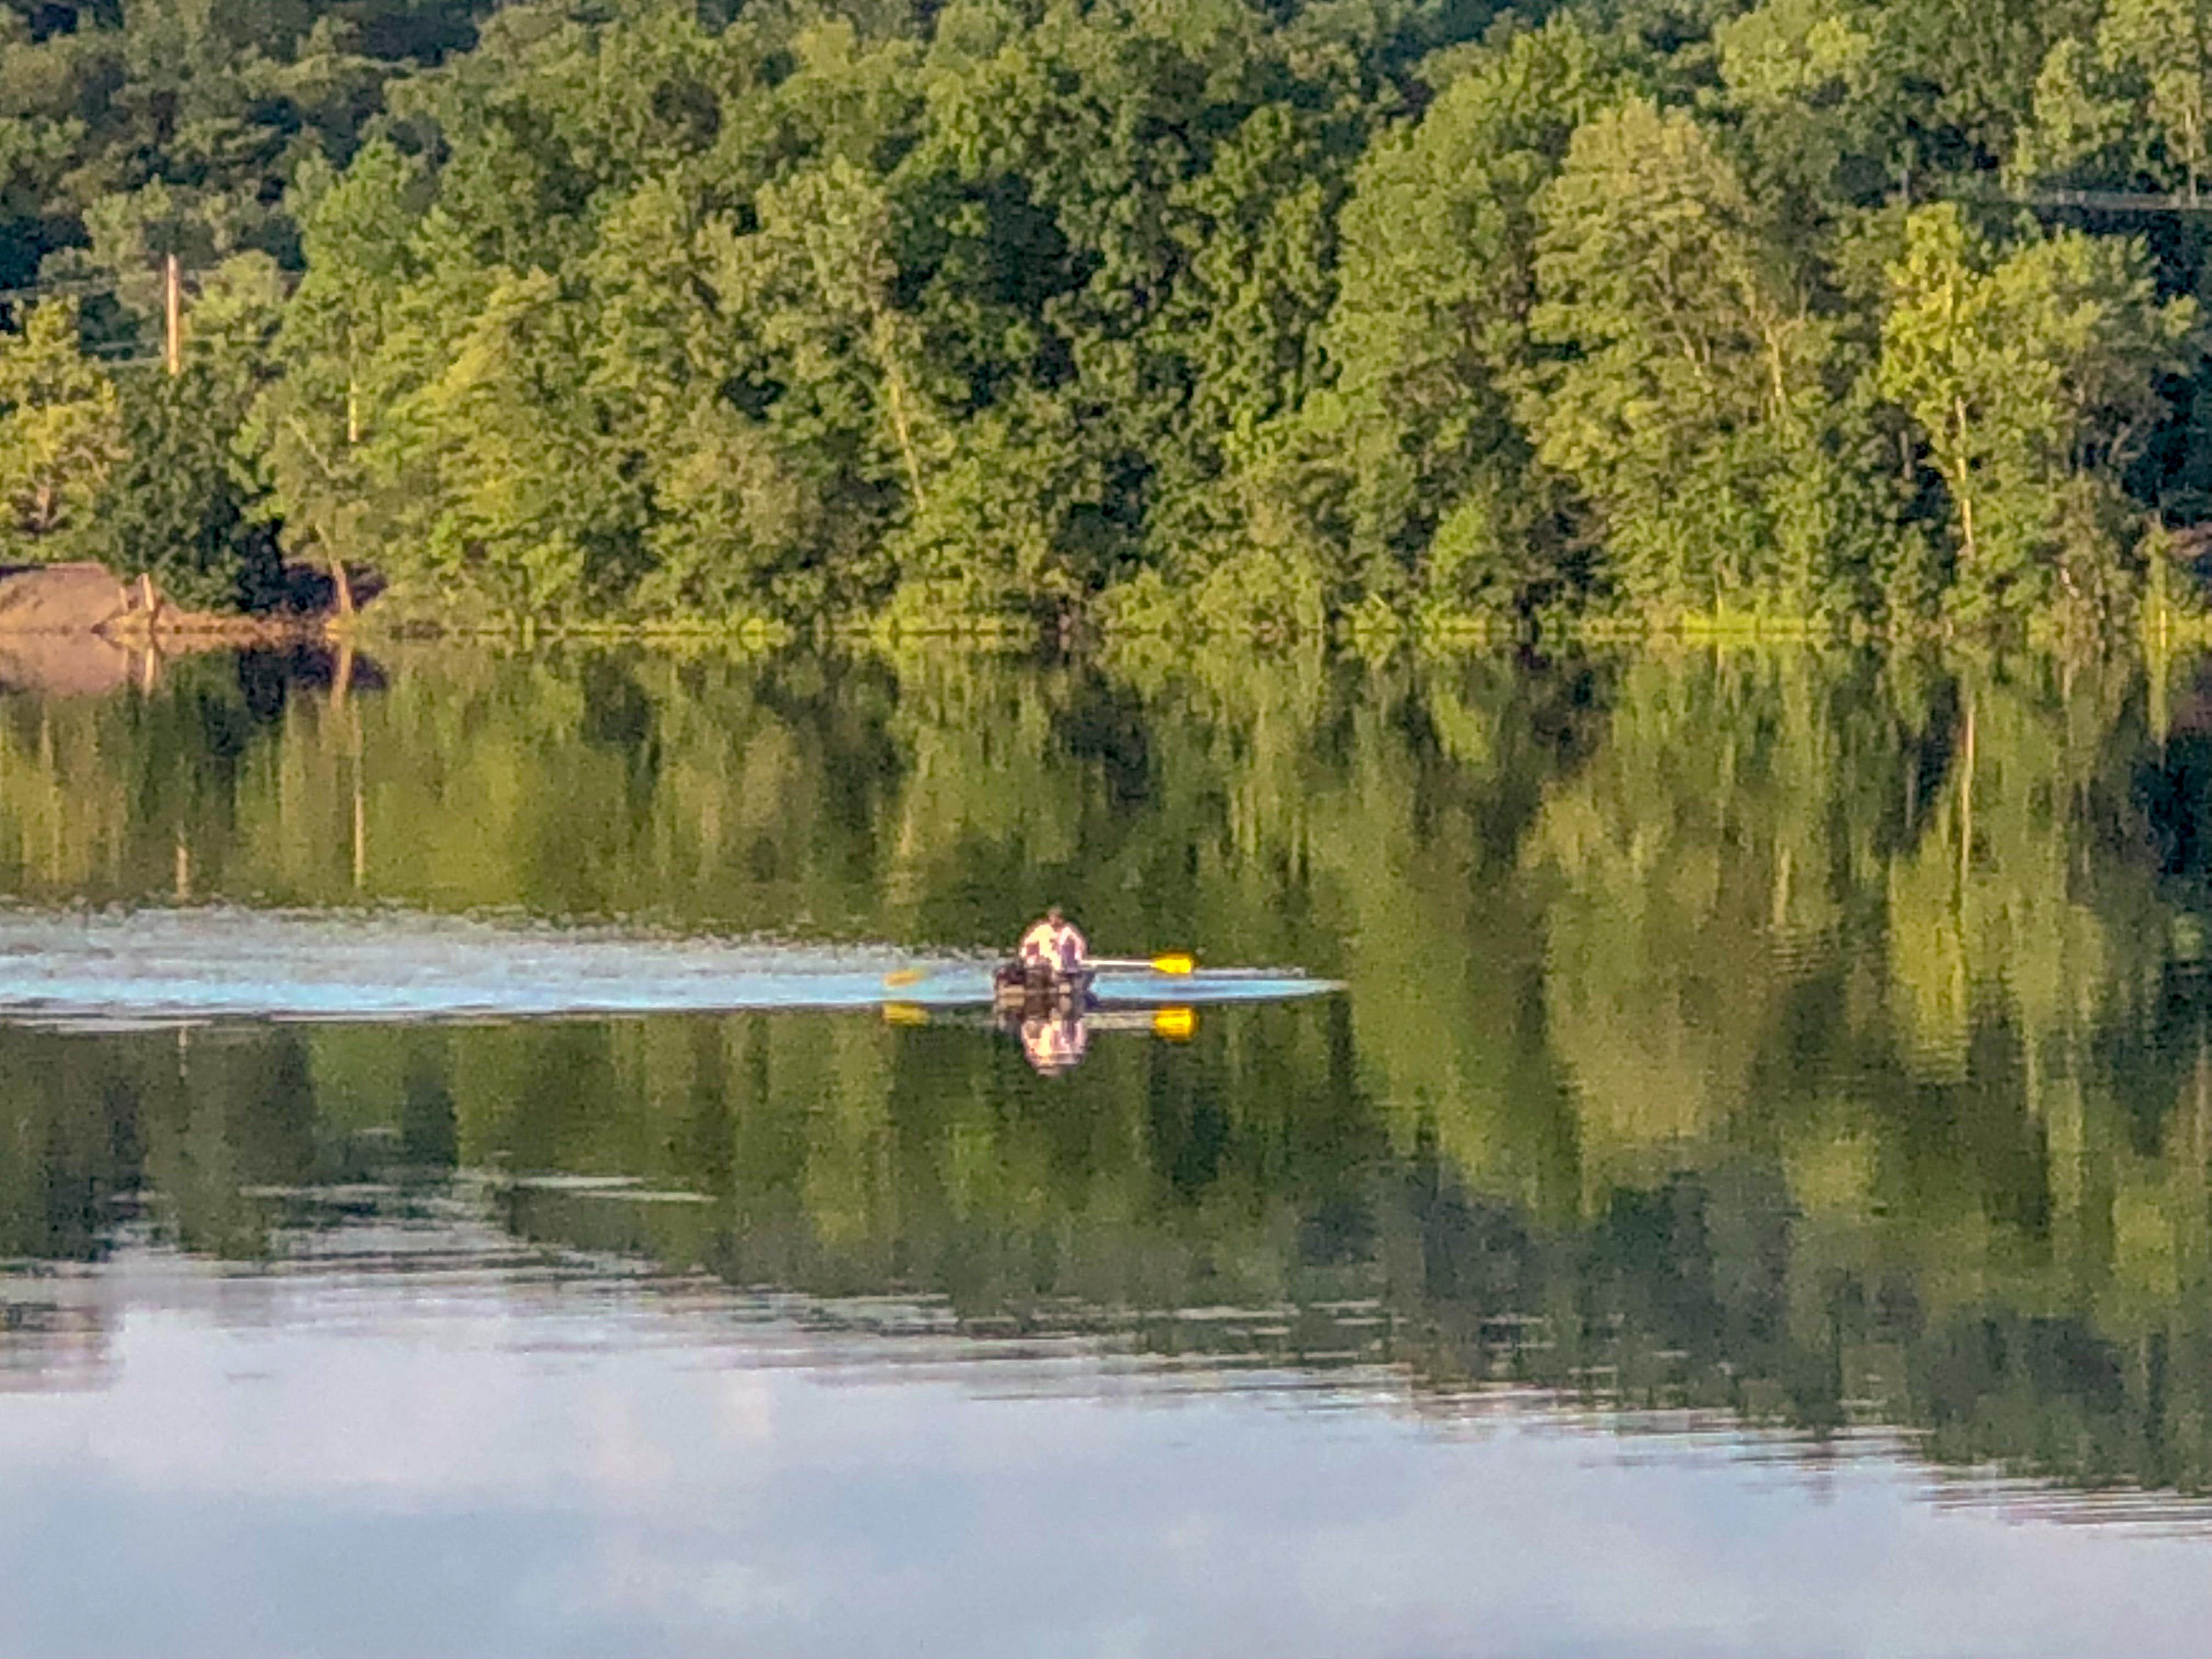 Canoe Fishing on Muscoot Reservoir